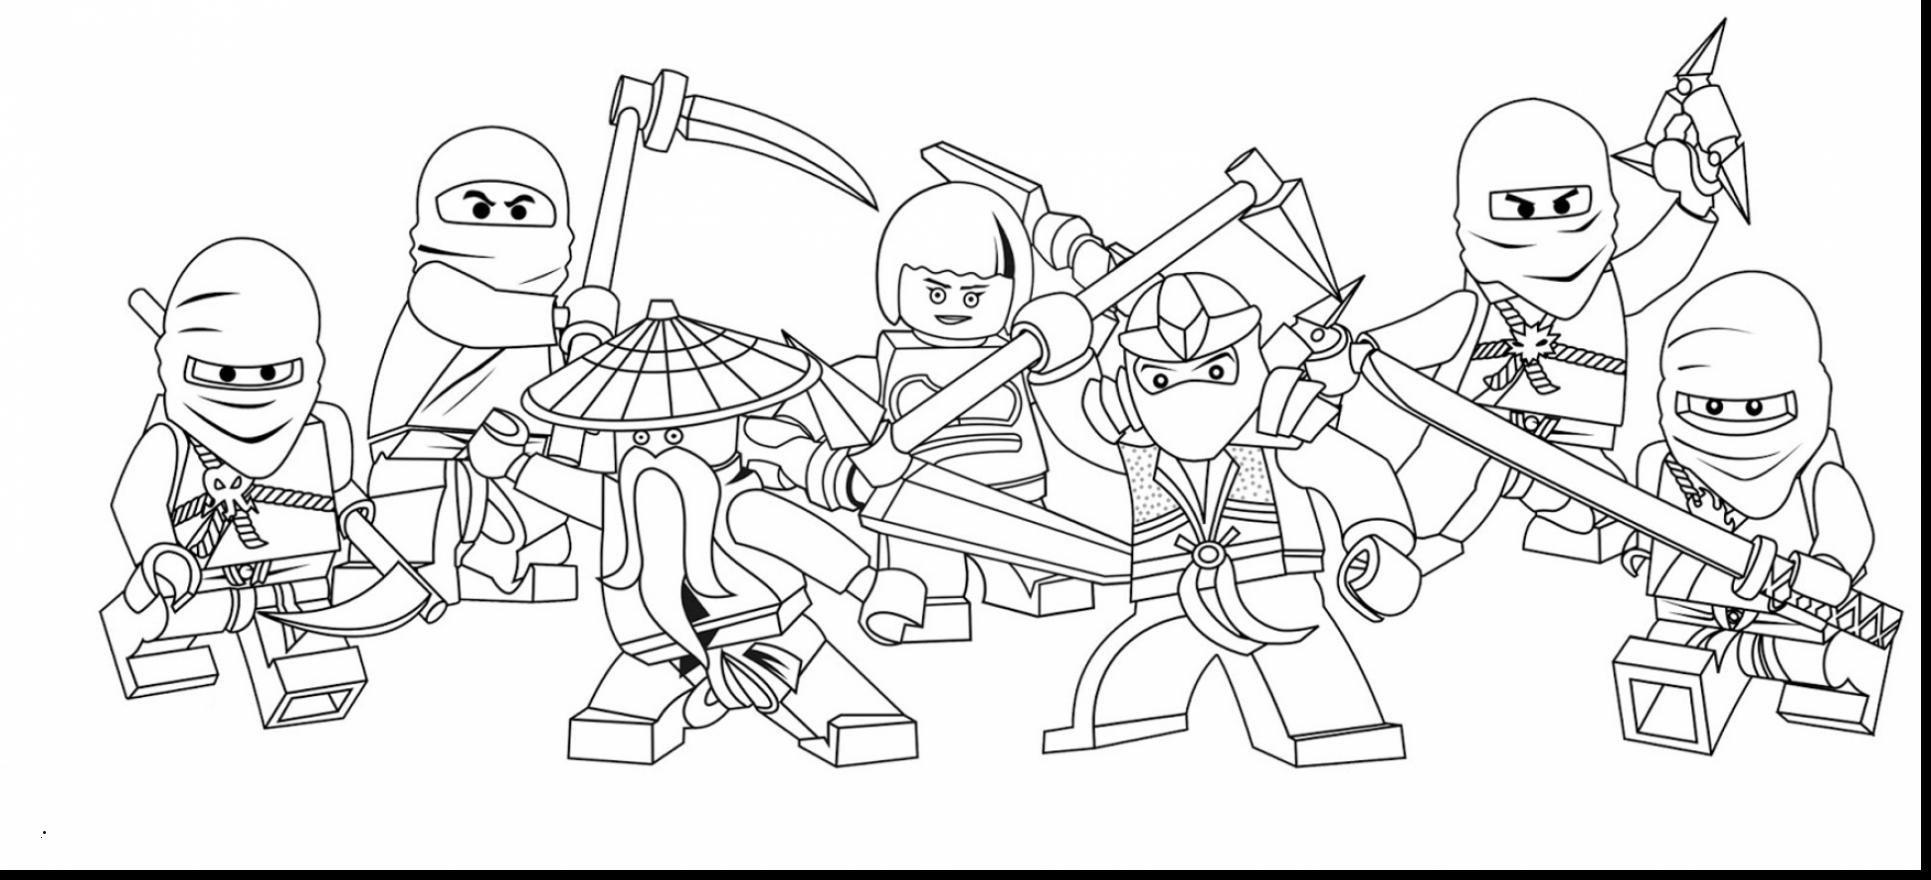 Ausmalbilder Ninjago Lloyd Genial Ninjago Ausmalbilder Lloyd élégant 48 Schön Lego Ninjago Galerie